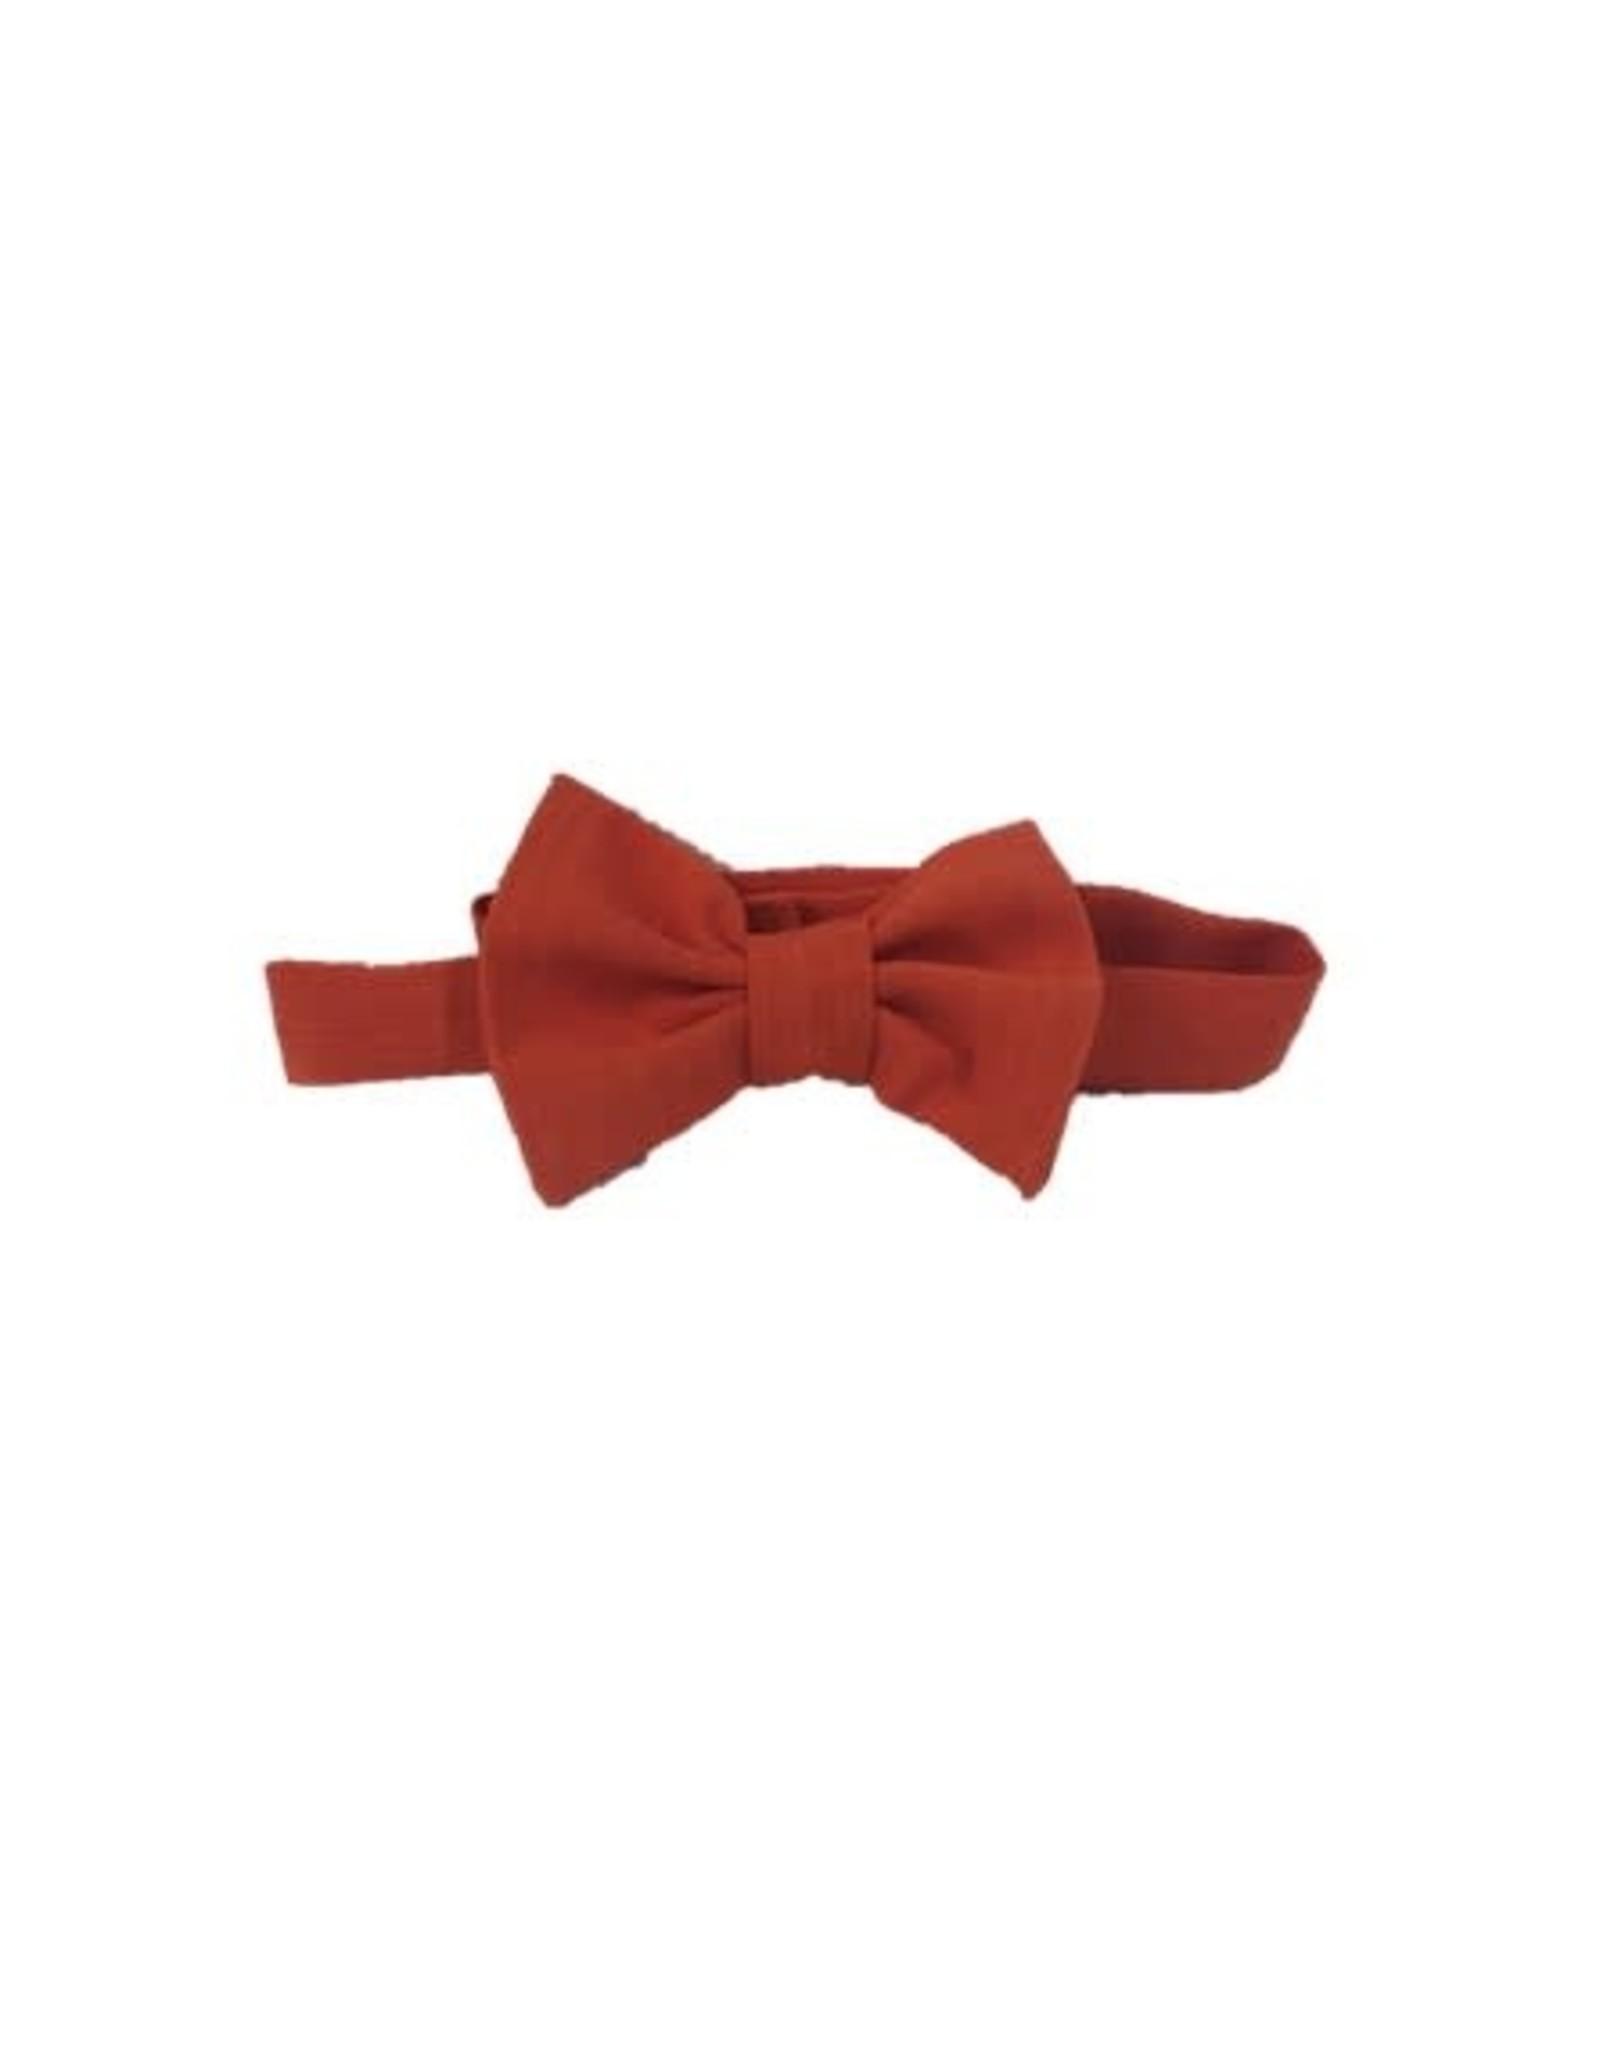 Karries Kostumes Orange Bow Tie